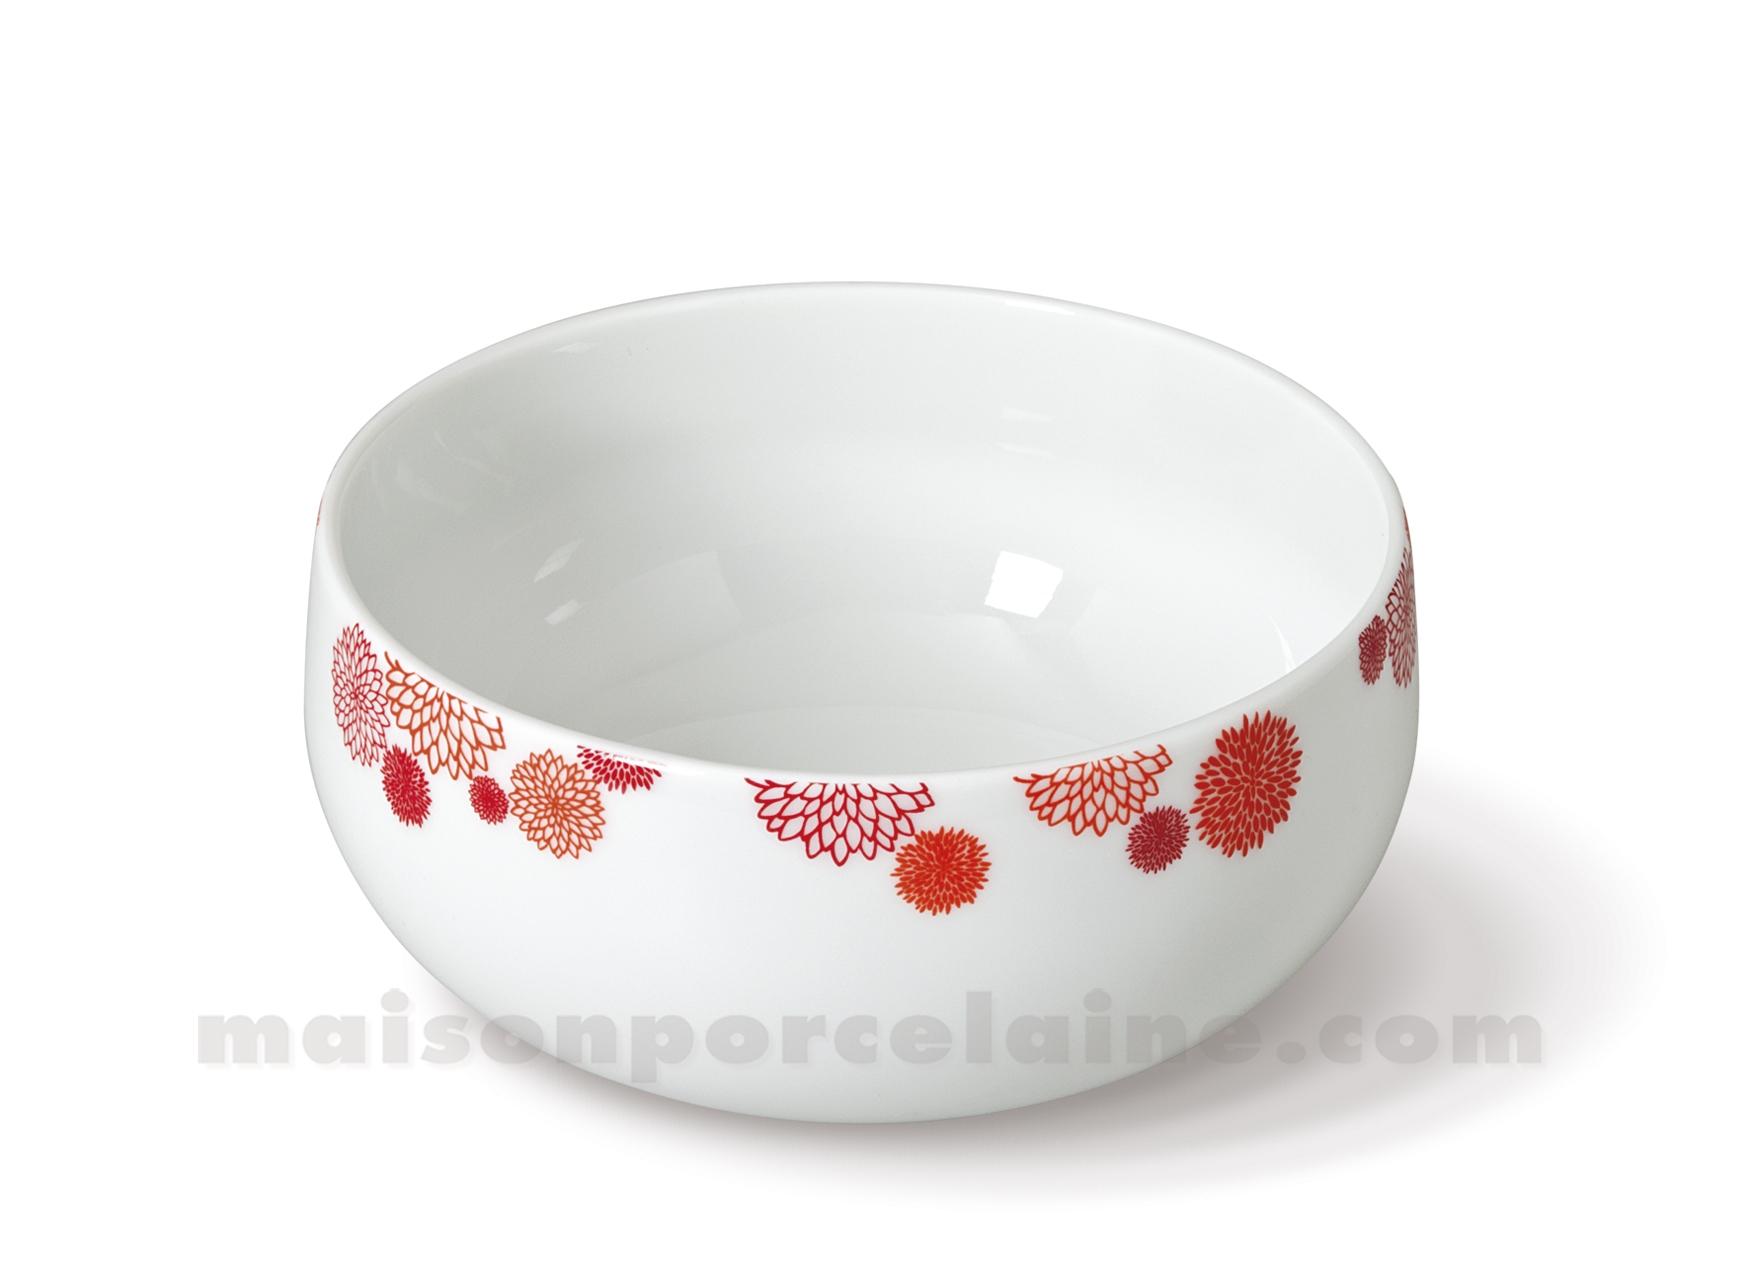 bol dejeuner cereales yaka tralala medard de noblat 50cl maison de la porcelaine. Black Bedroom Furniture Sets. Home Design Ideas